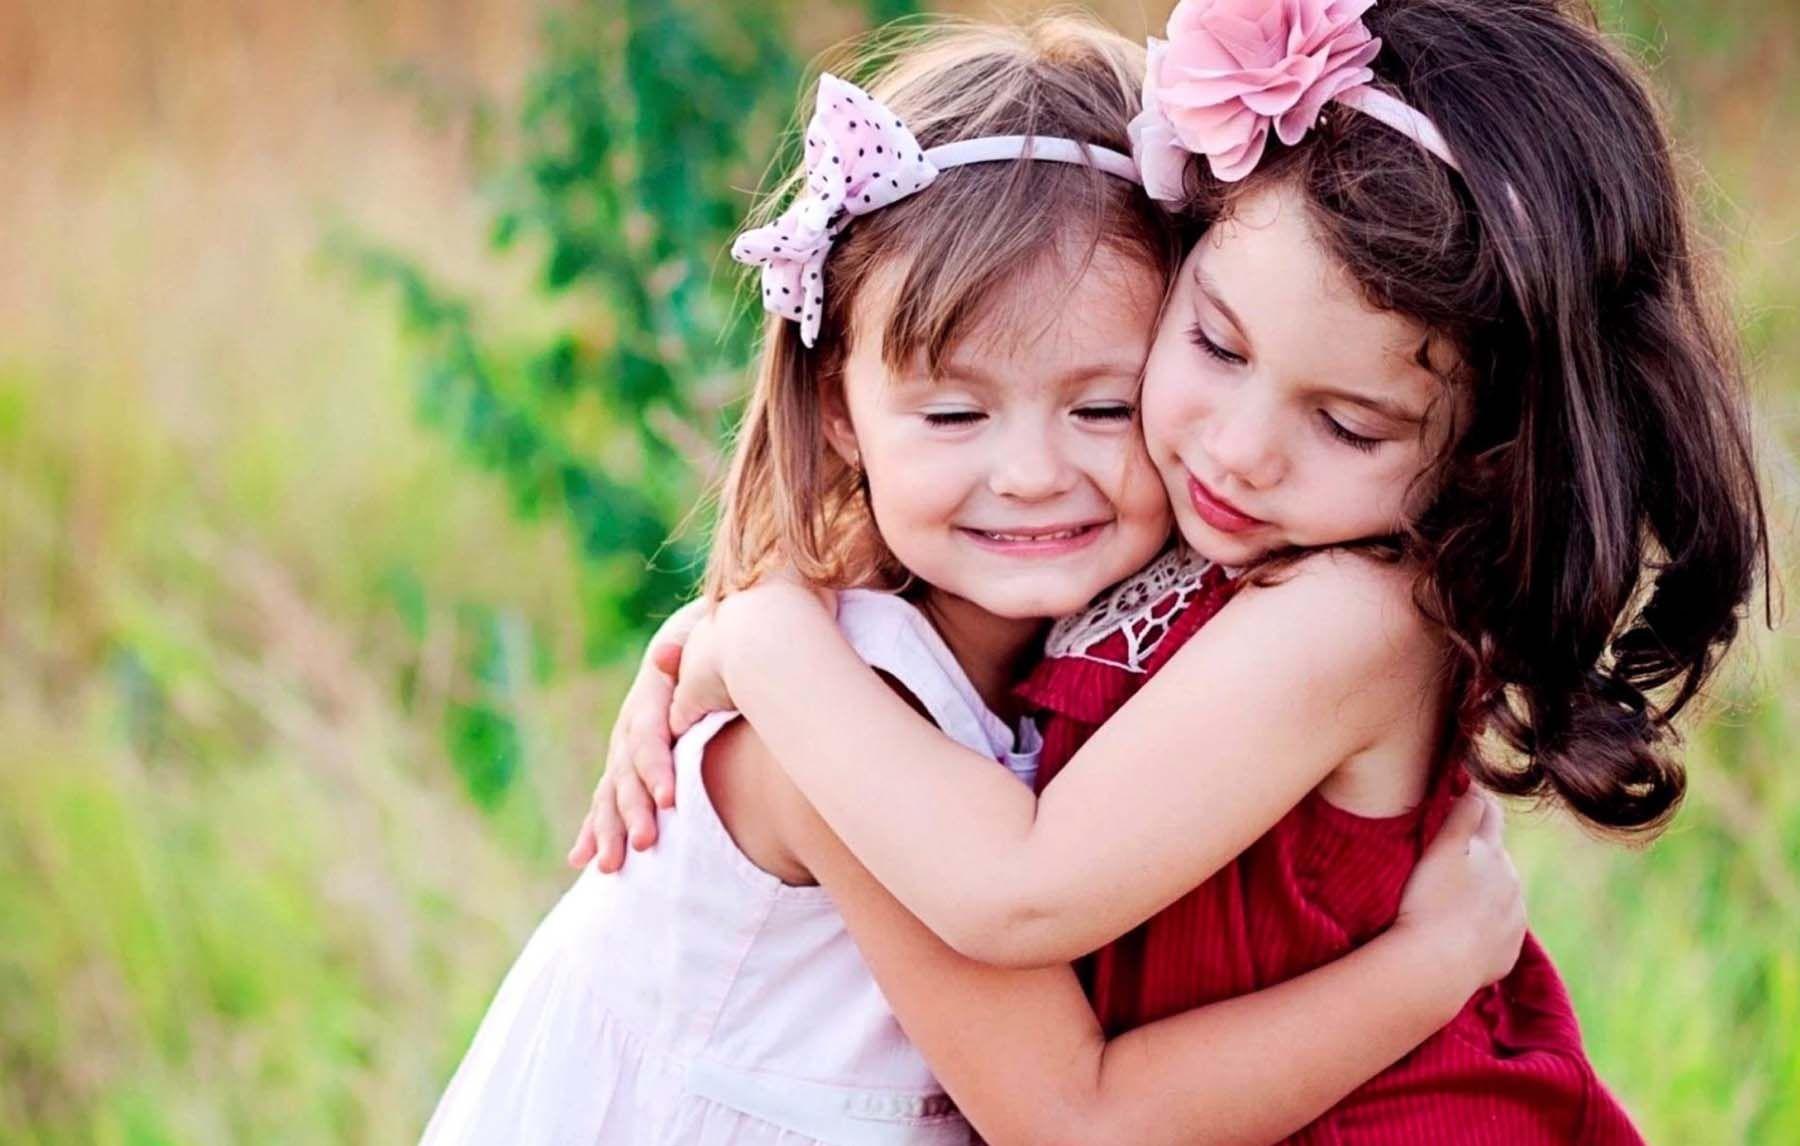 Innocent Babies Super Cute Wallpapers Hd 1080p Gadis